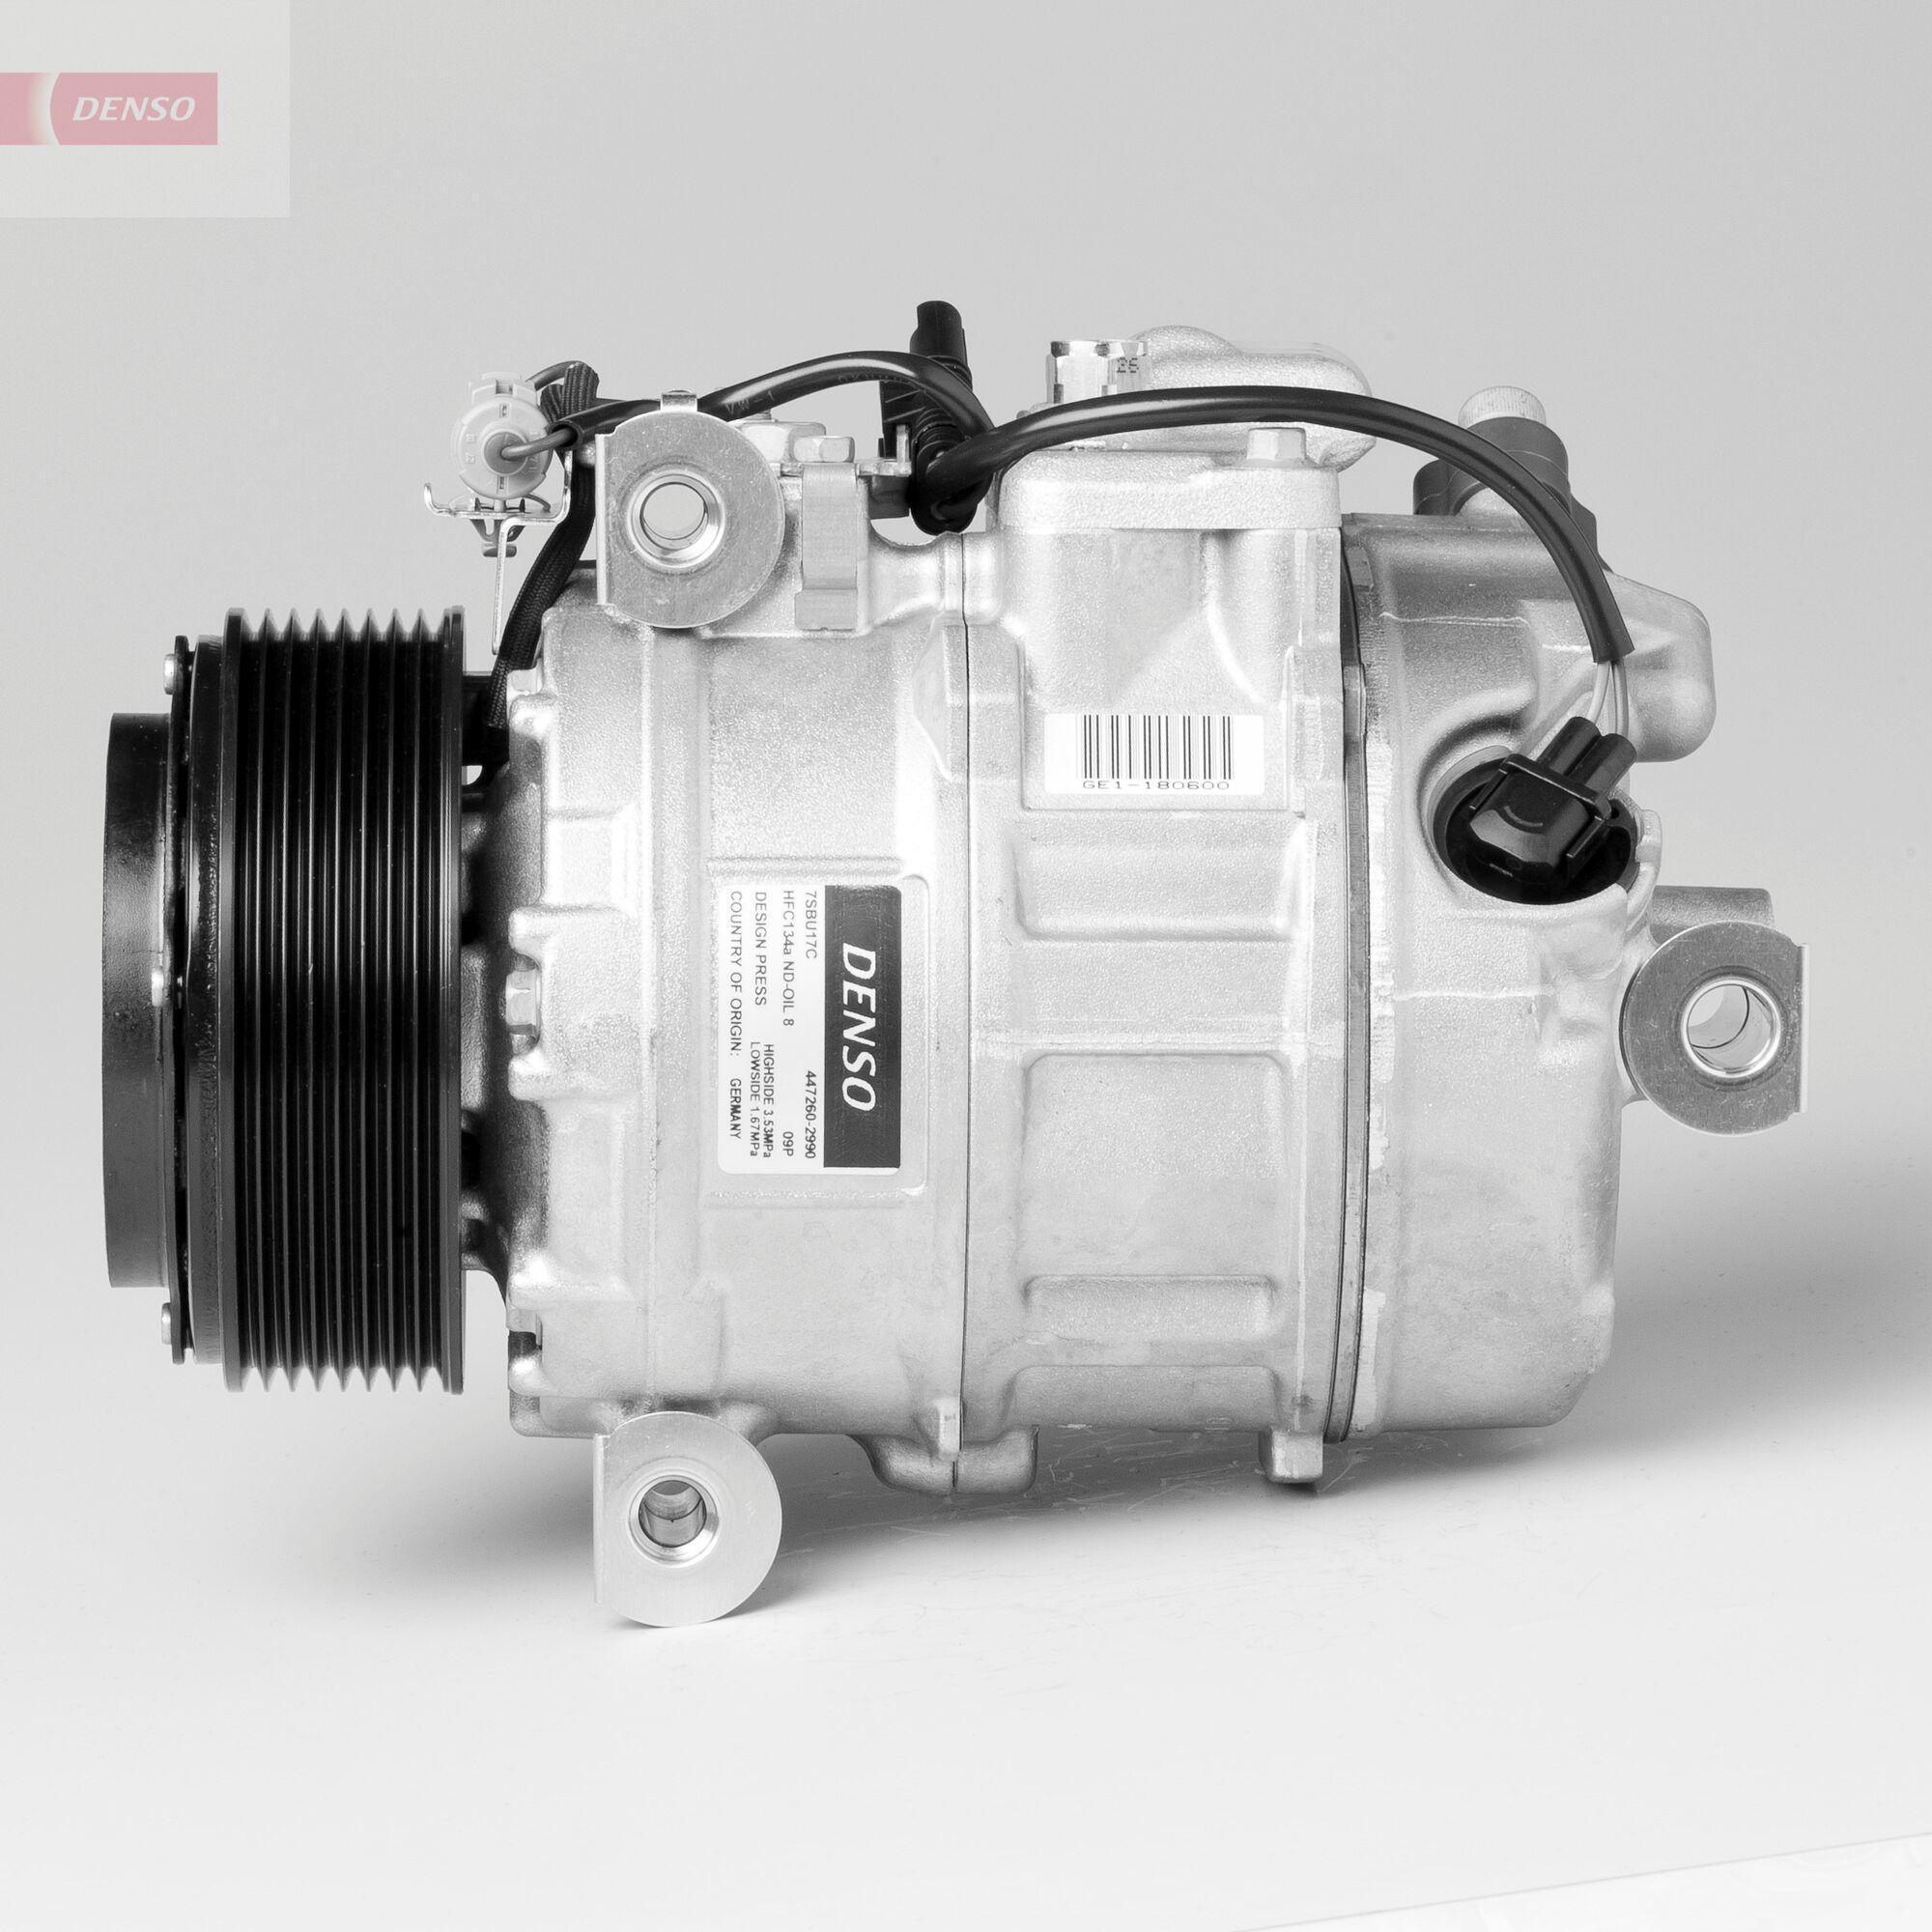 Kompressor Klimaanlage DENSO DCP05081